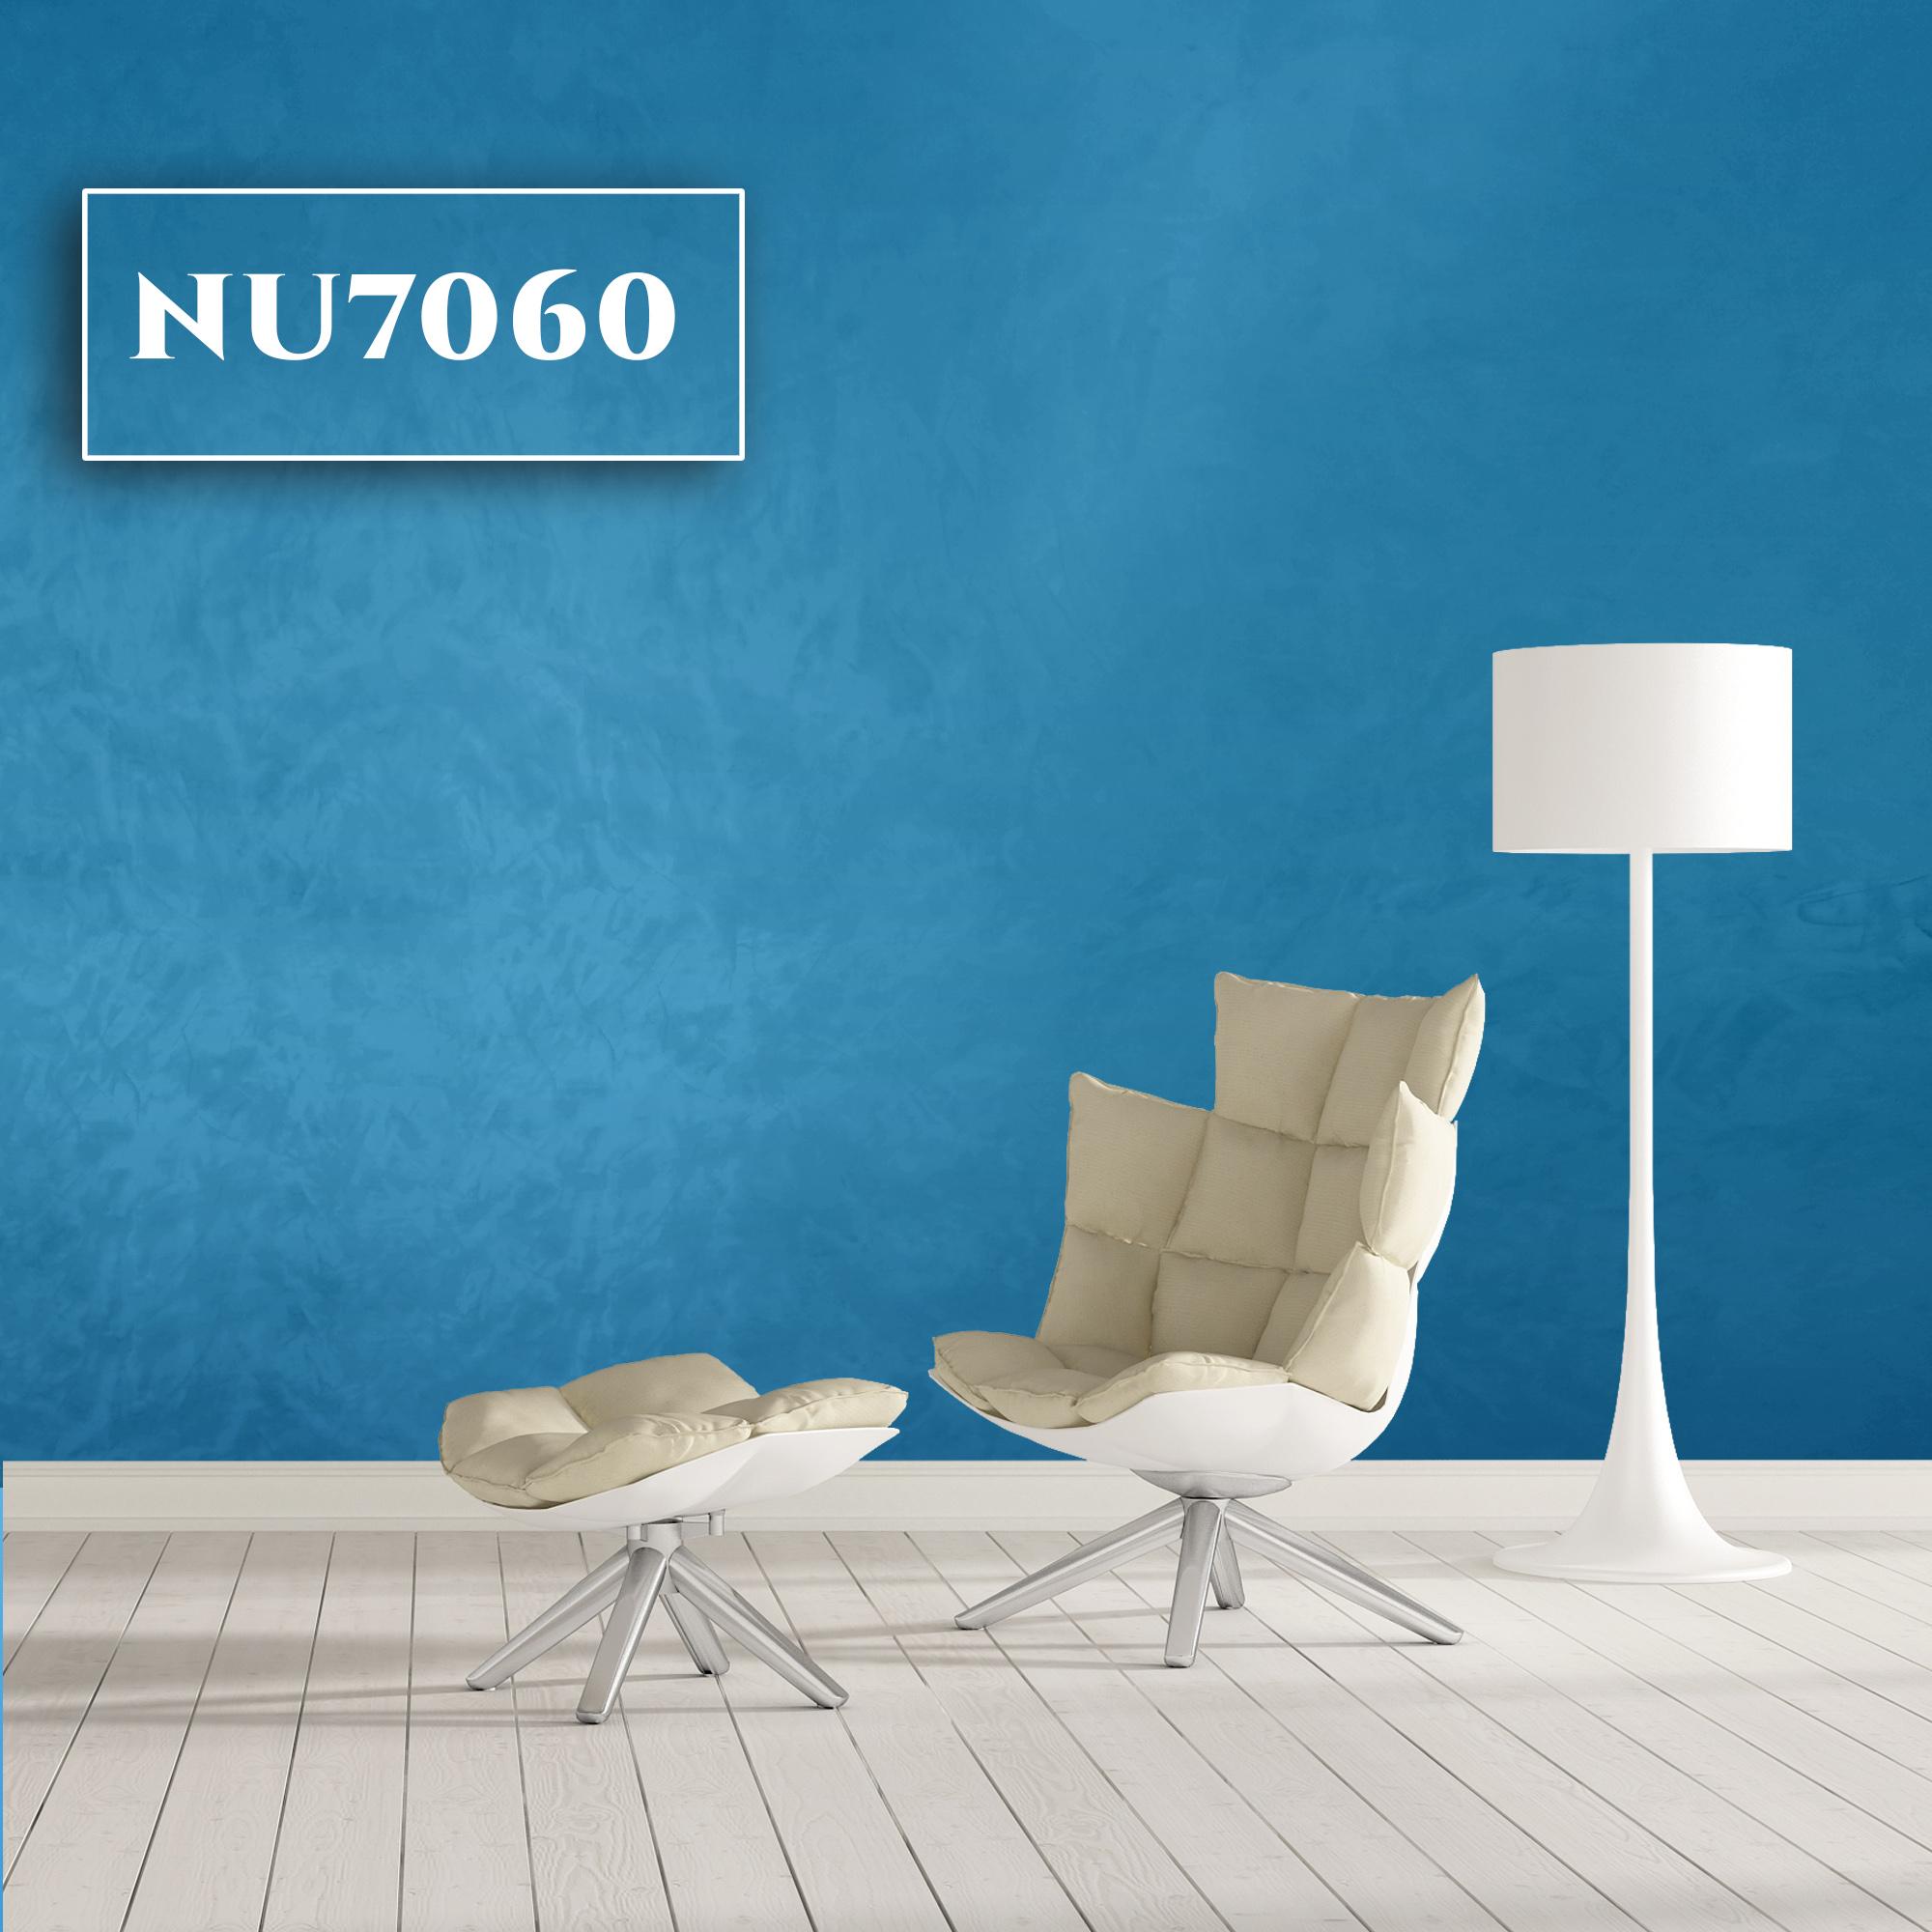 NU7060